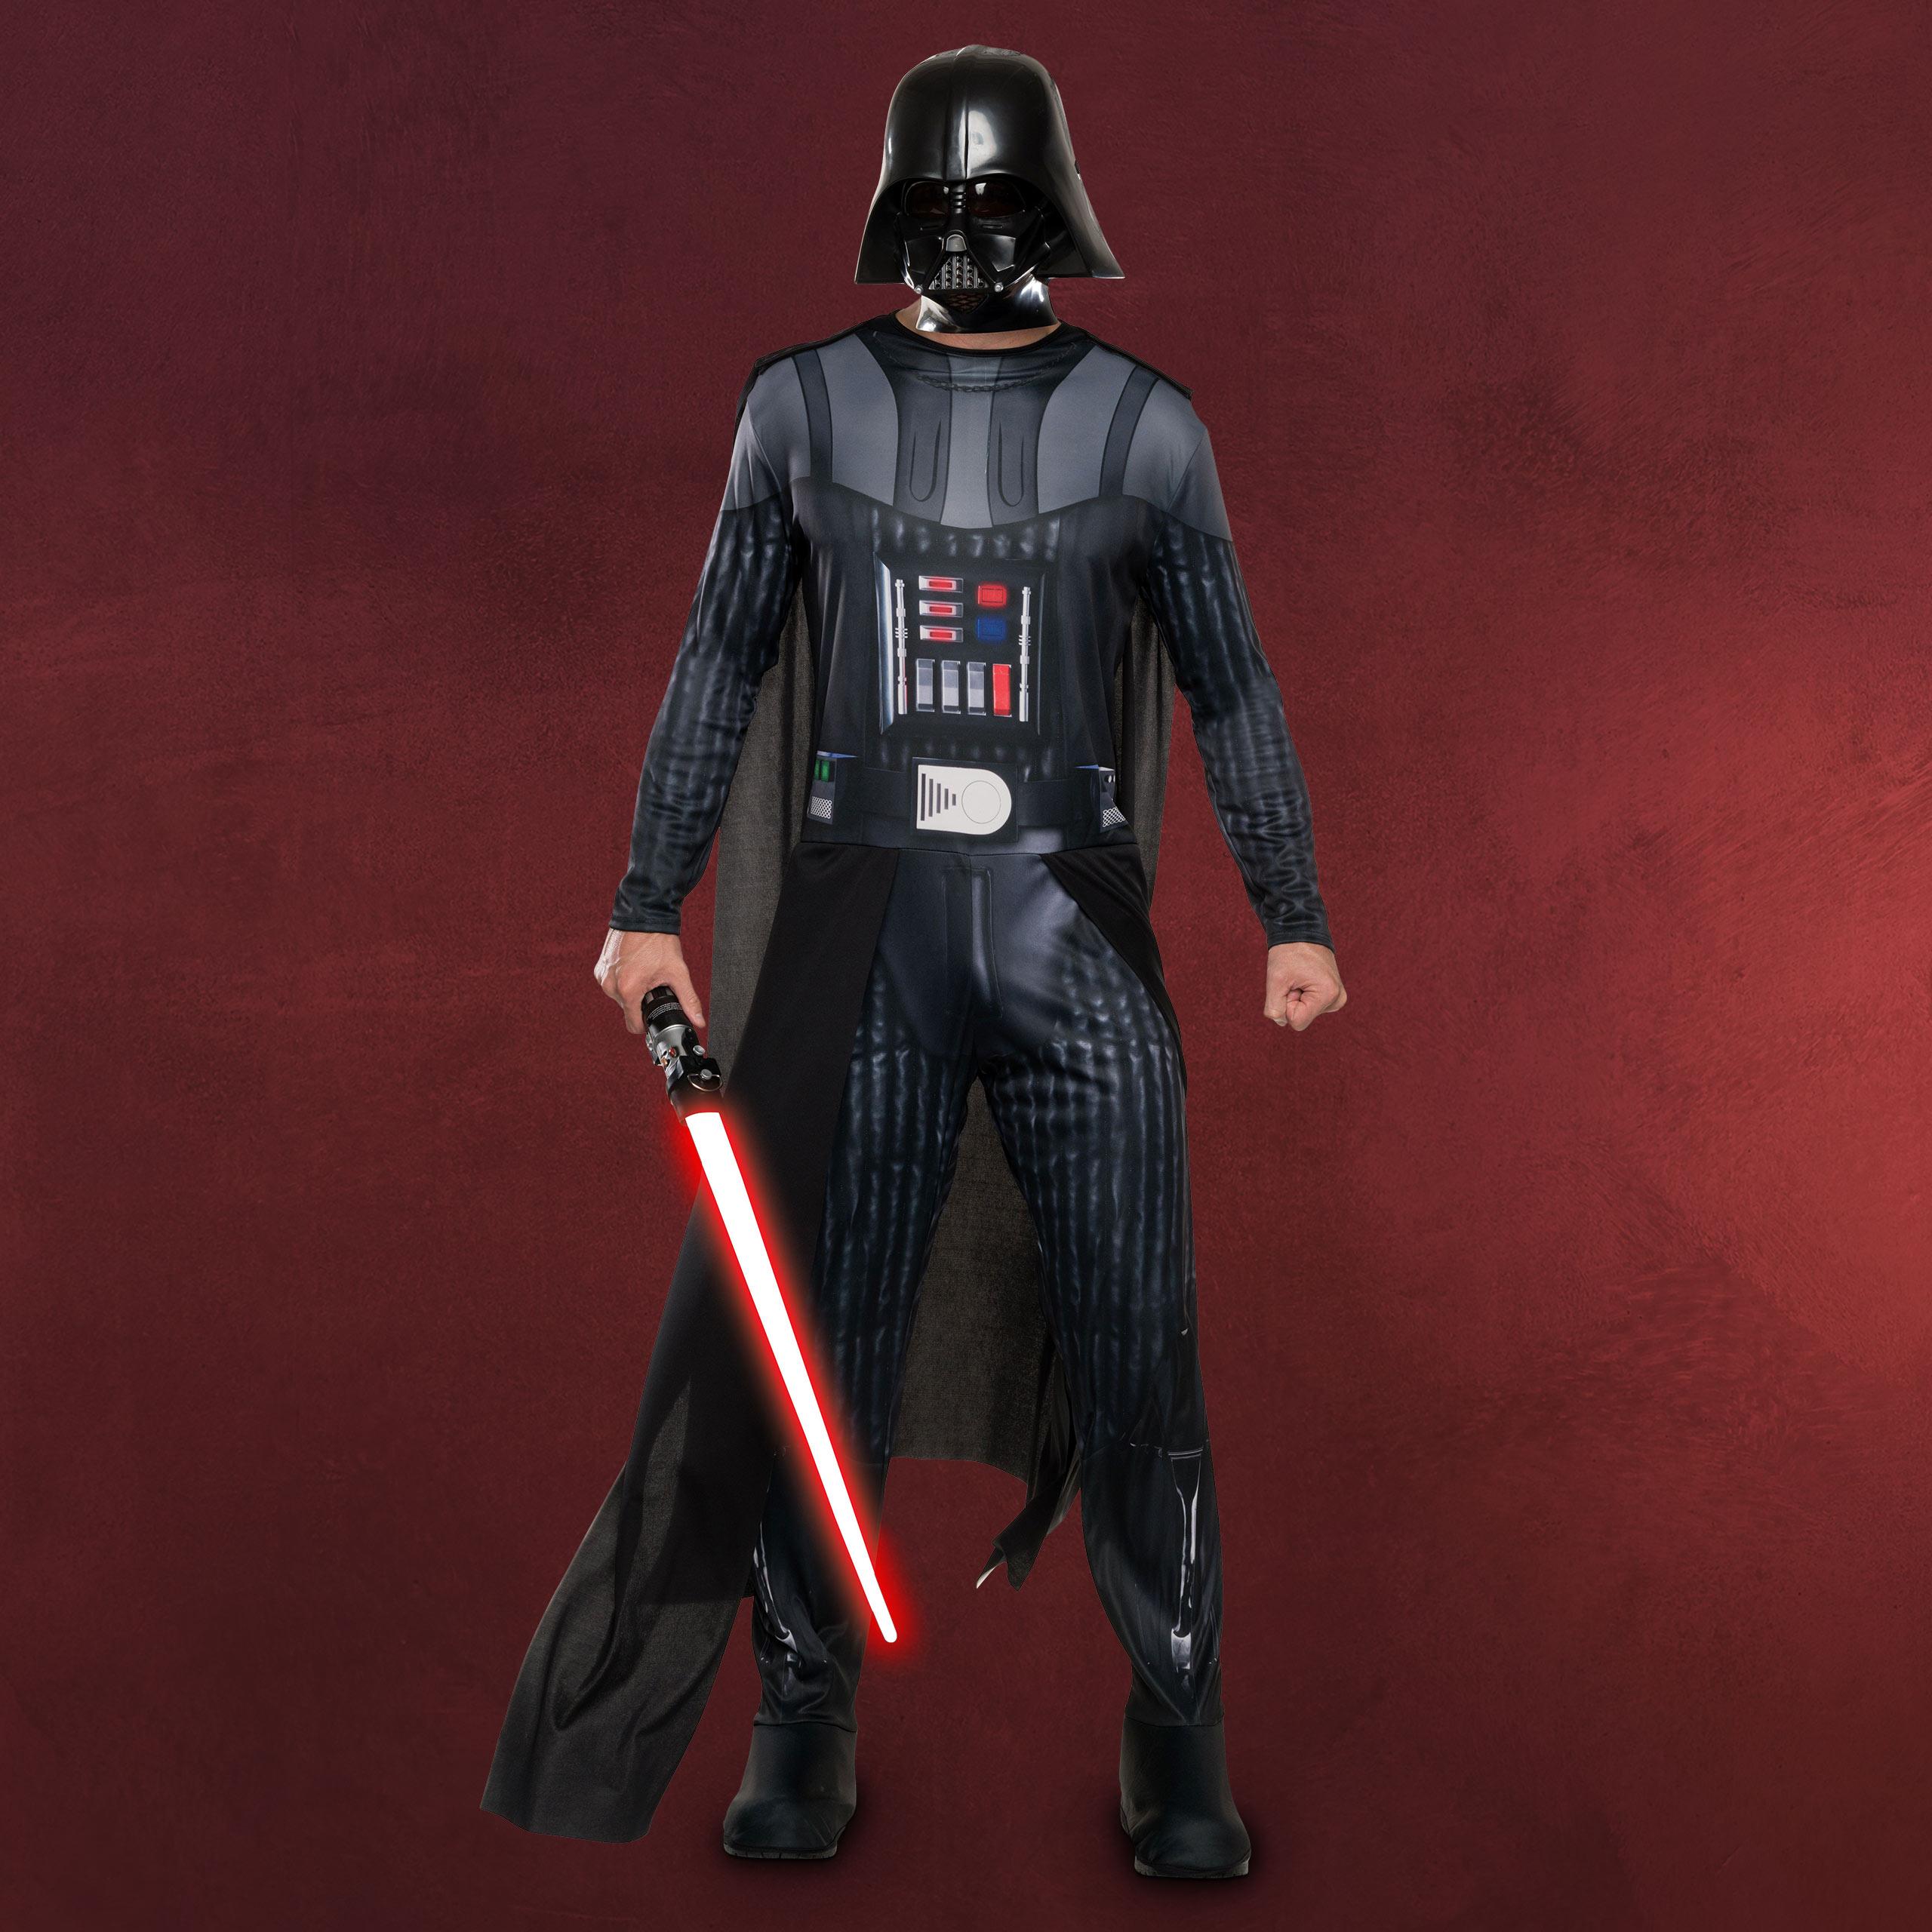 Star Wars Darth Vader Kostm Herren Elbenwald